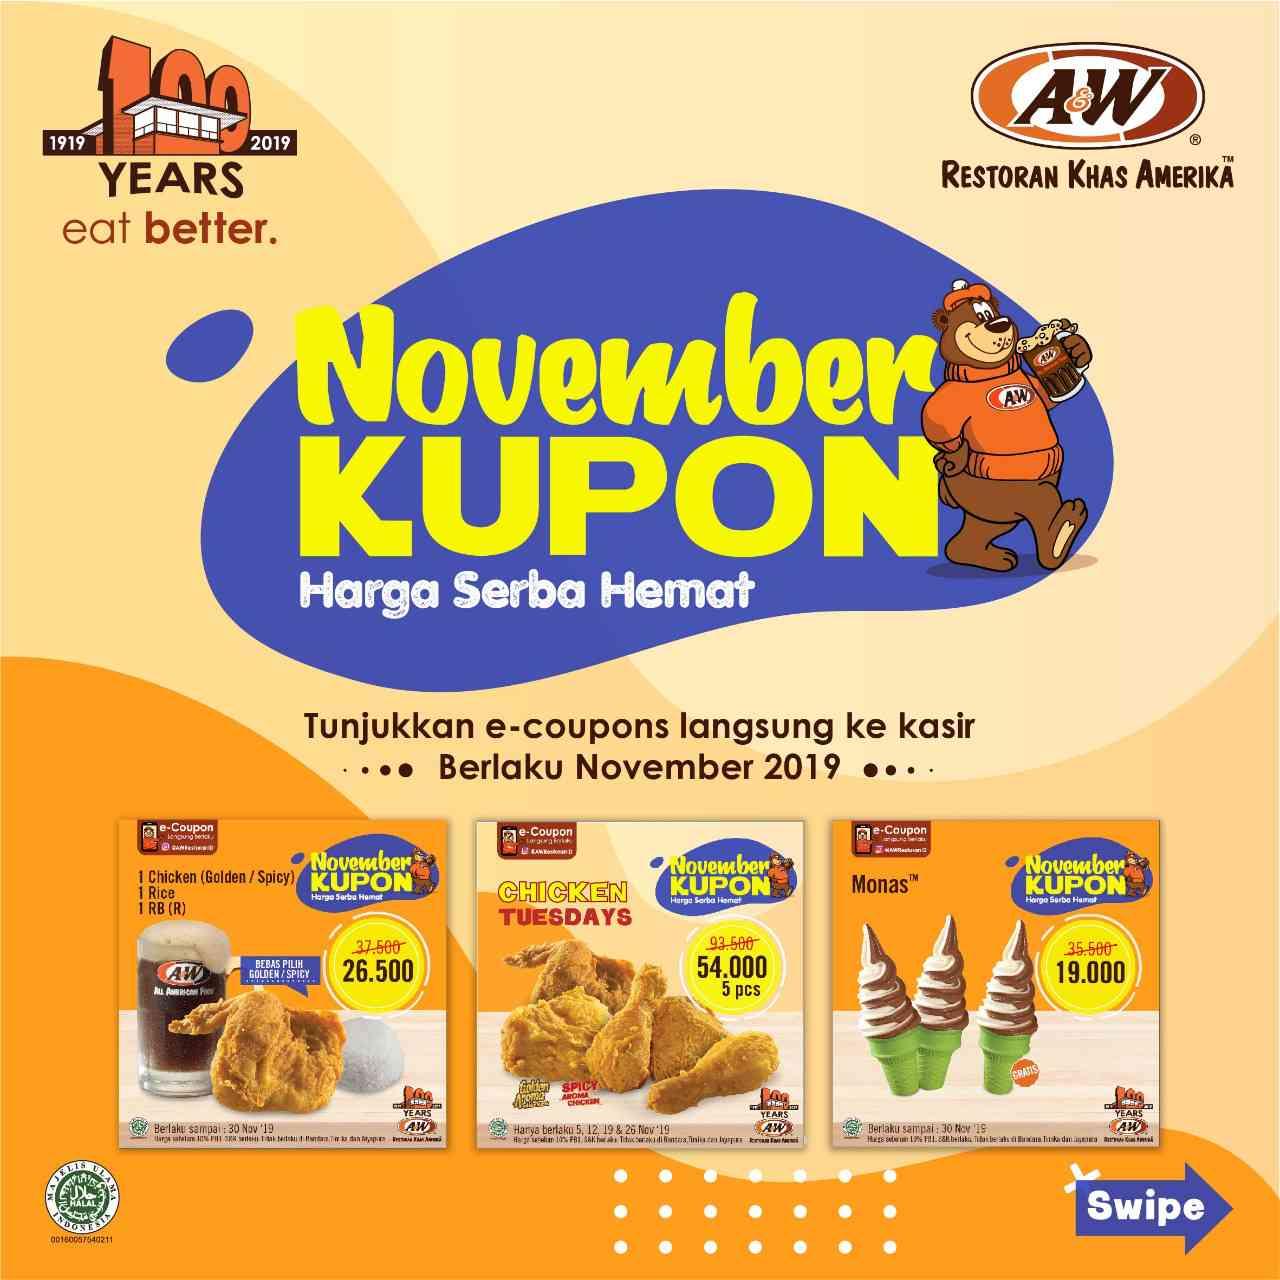 A&W Promo Kupon November Hemat